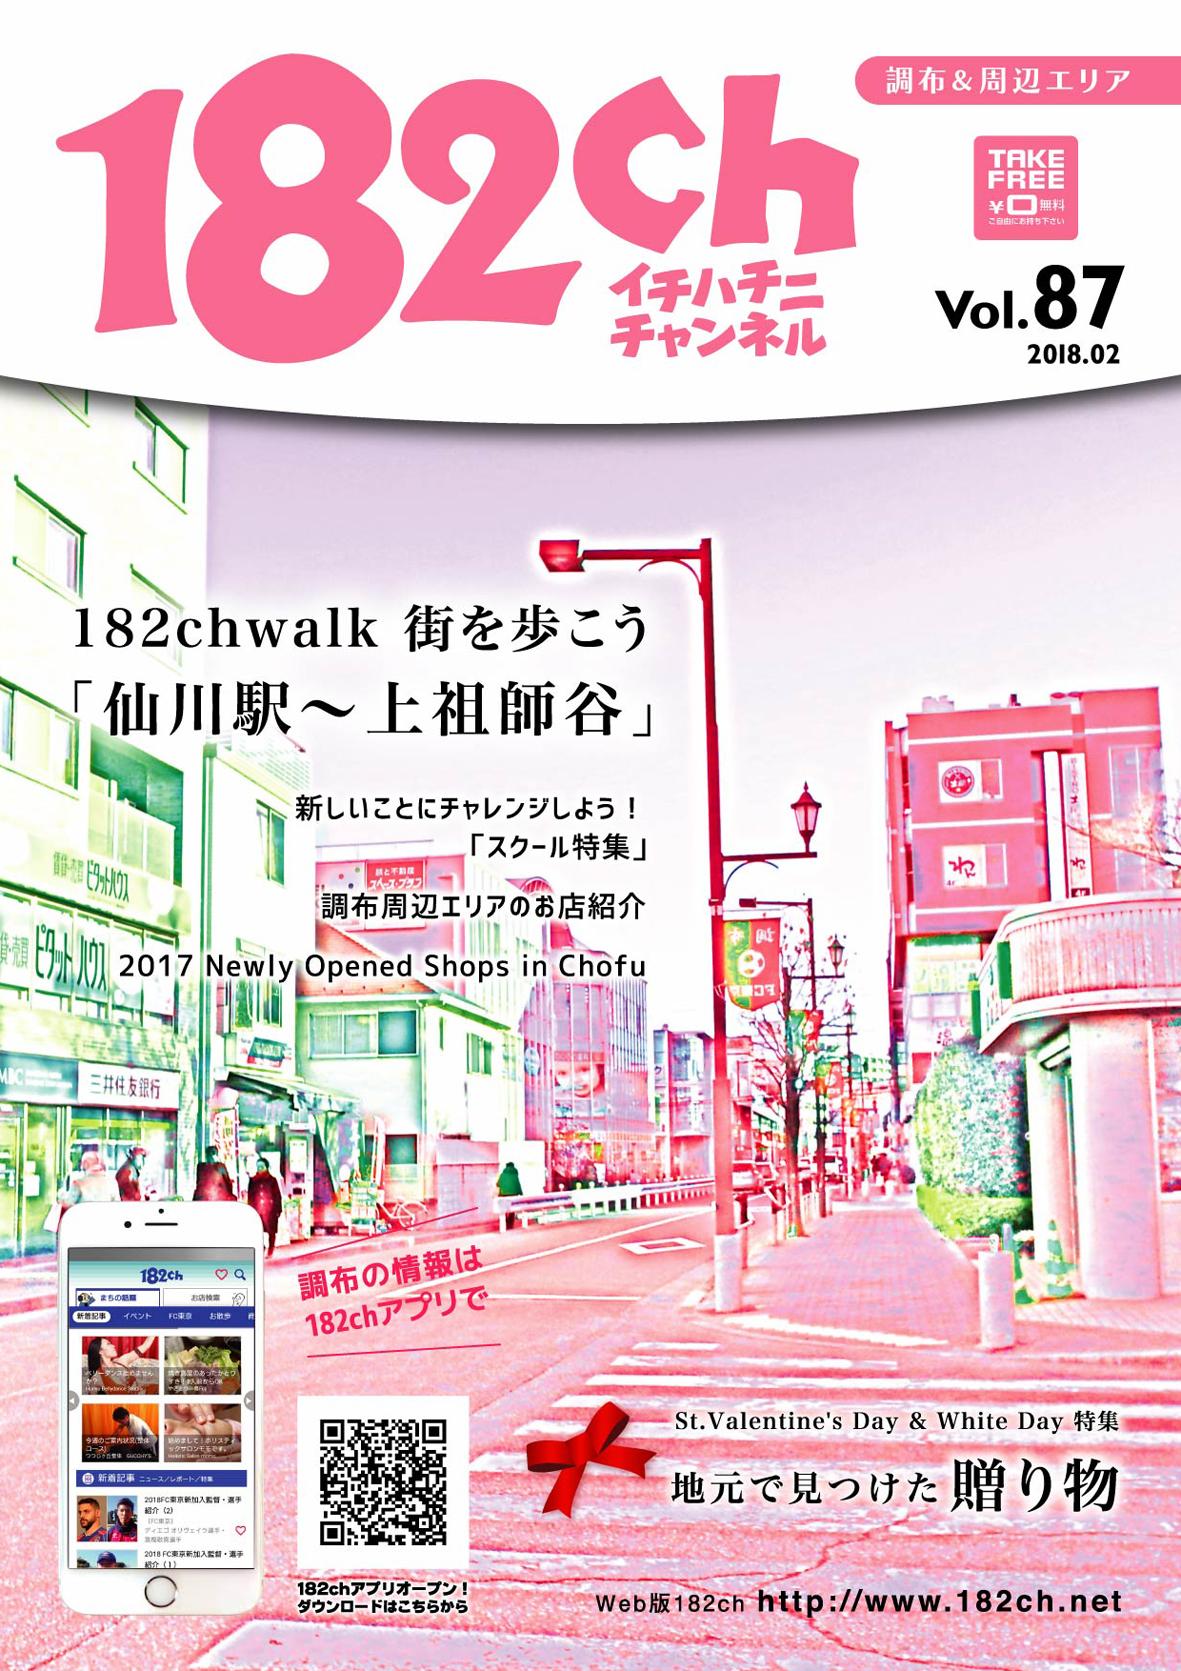 182ch vol.87